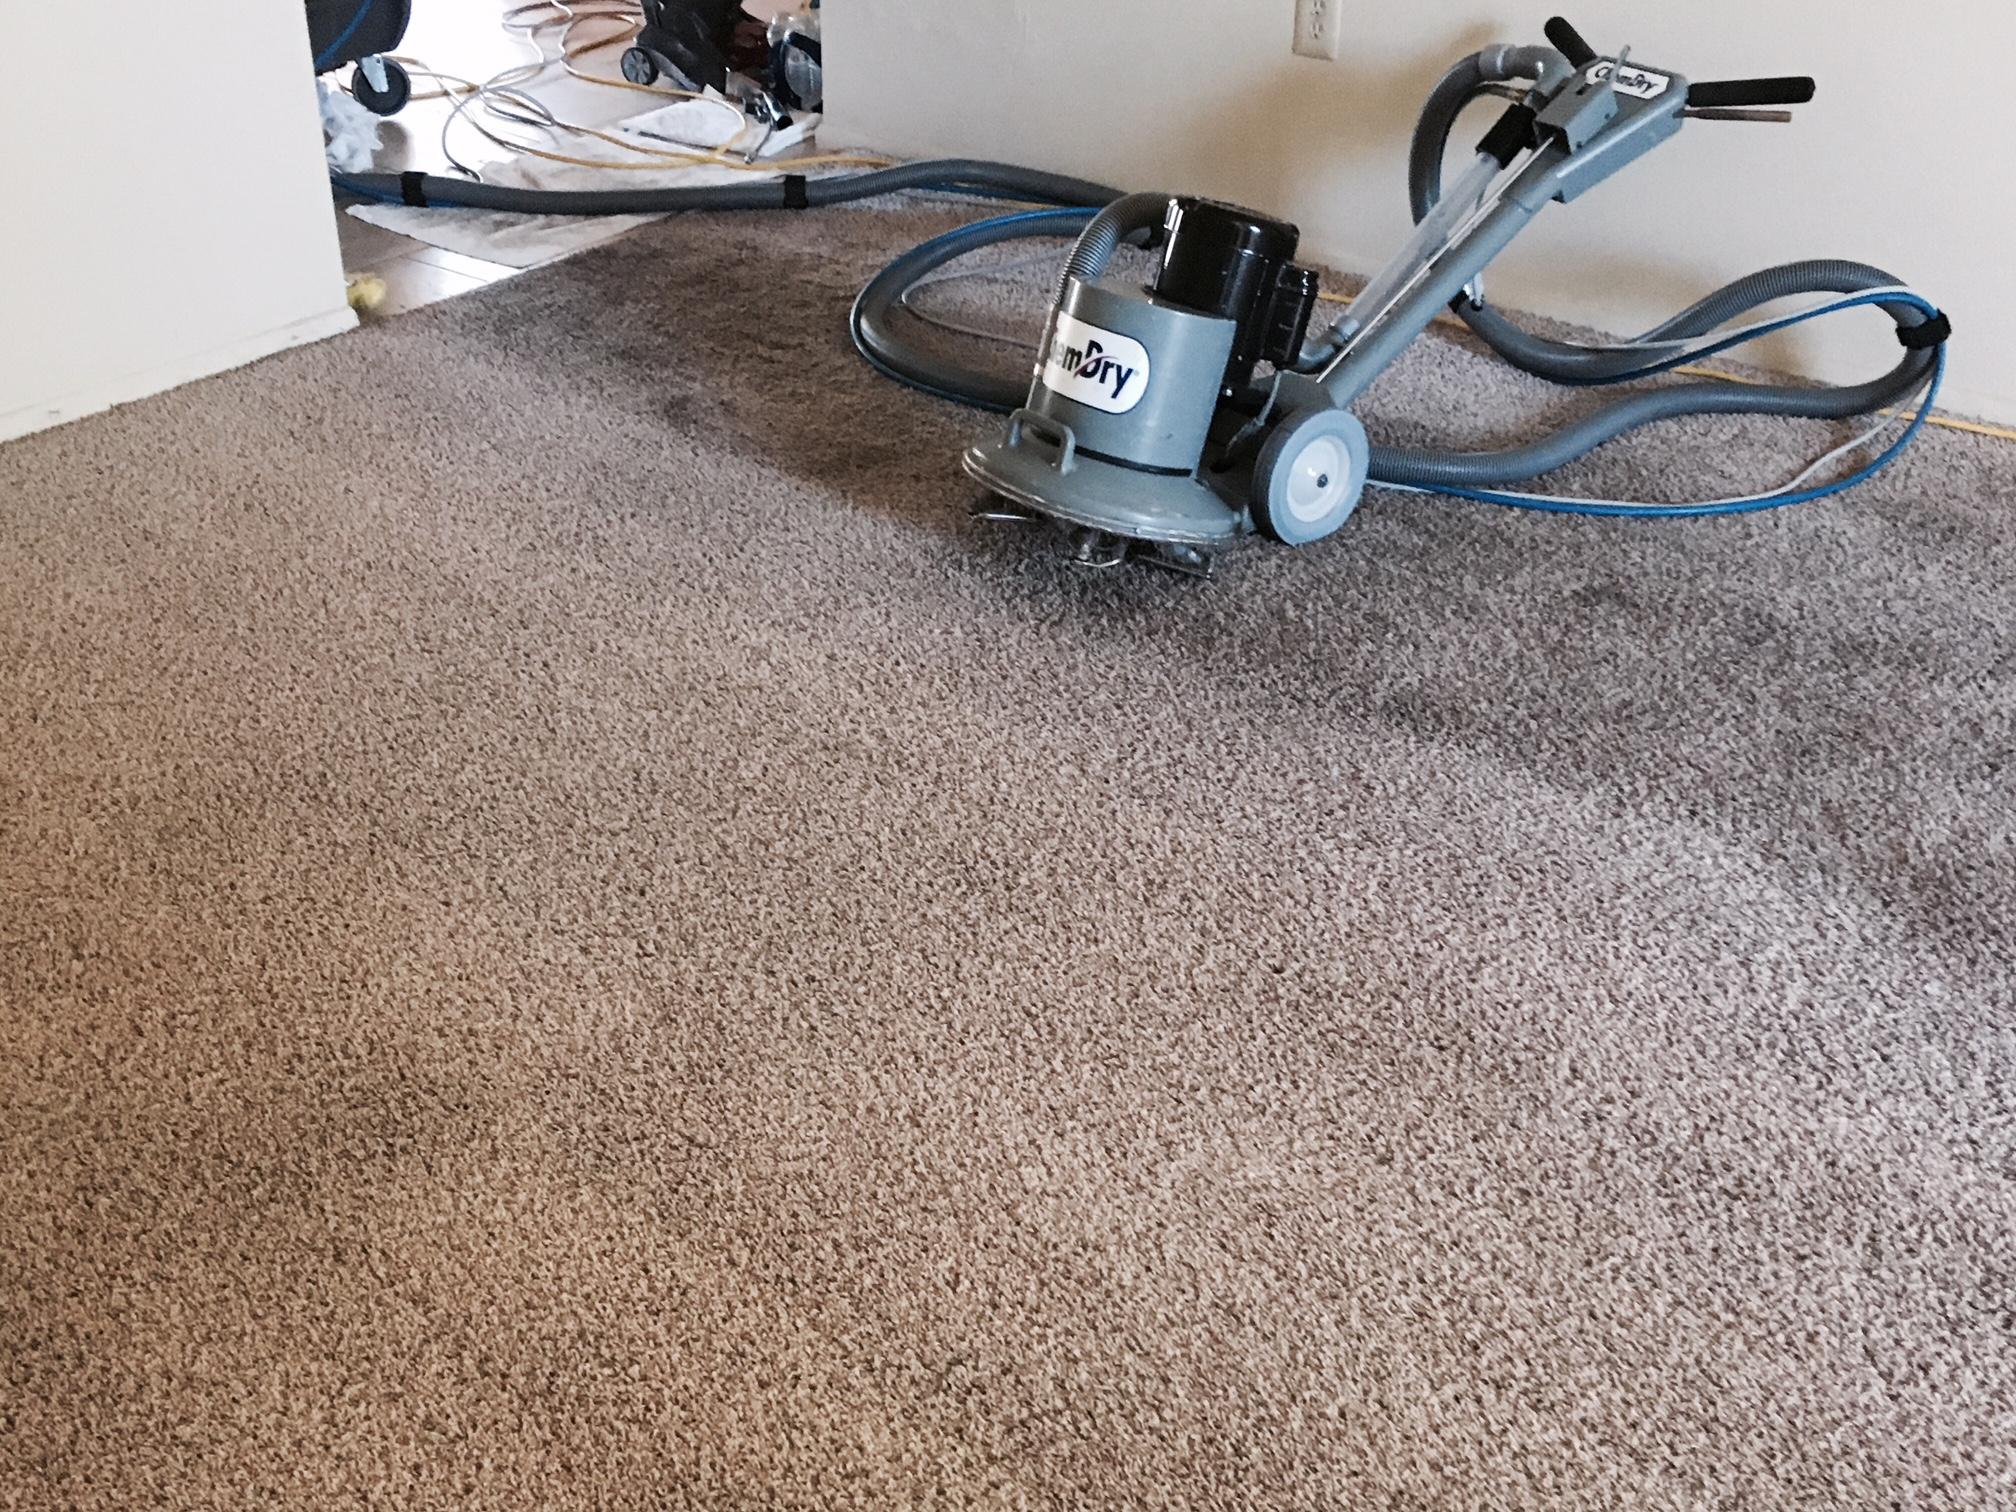 Sunrise Chem Dry Carpet Cleaning Peoria Arizona